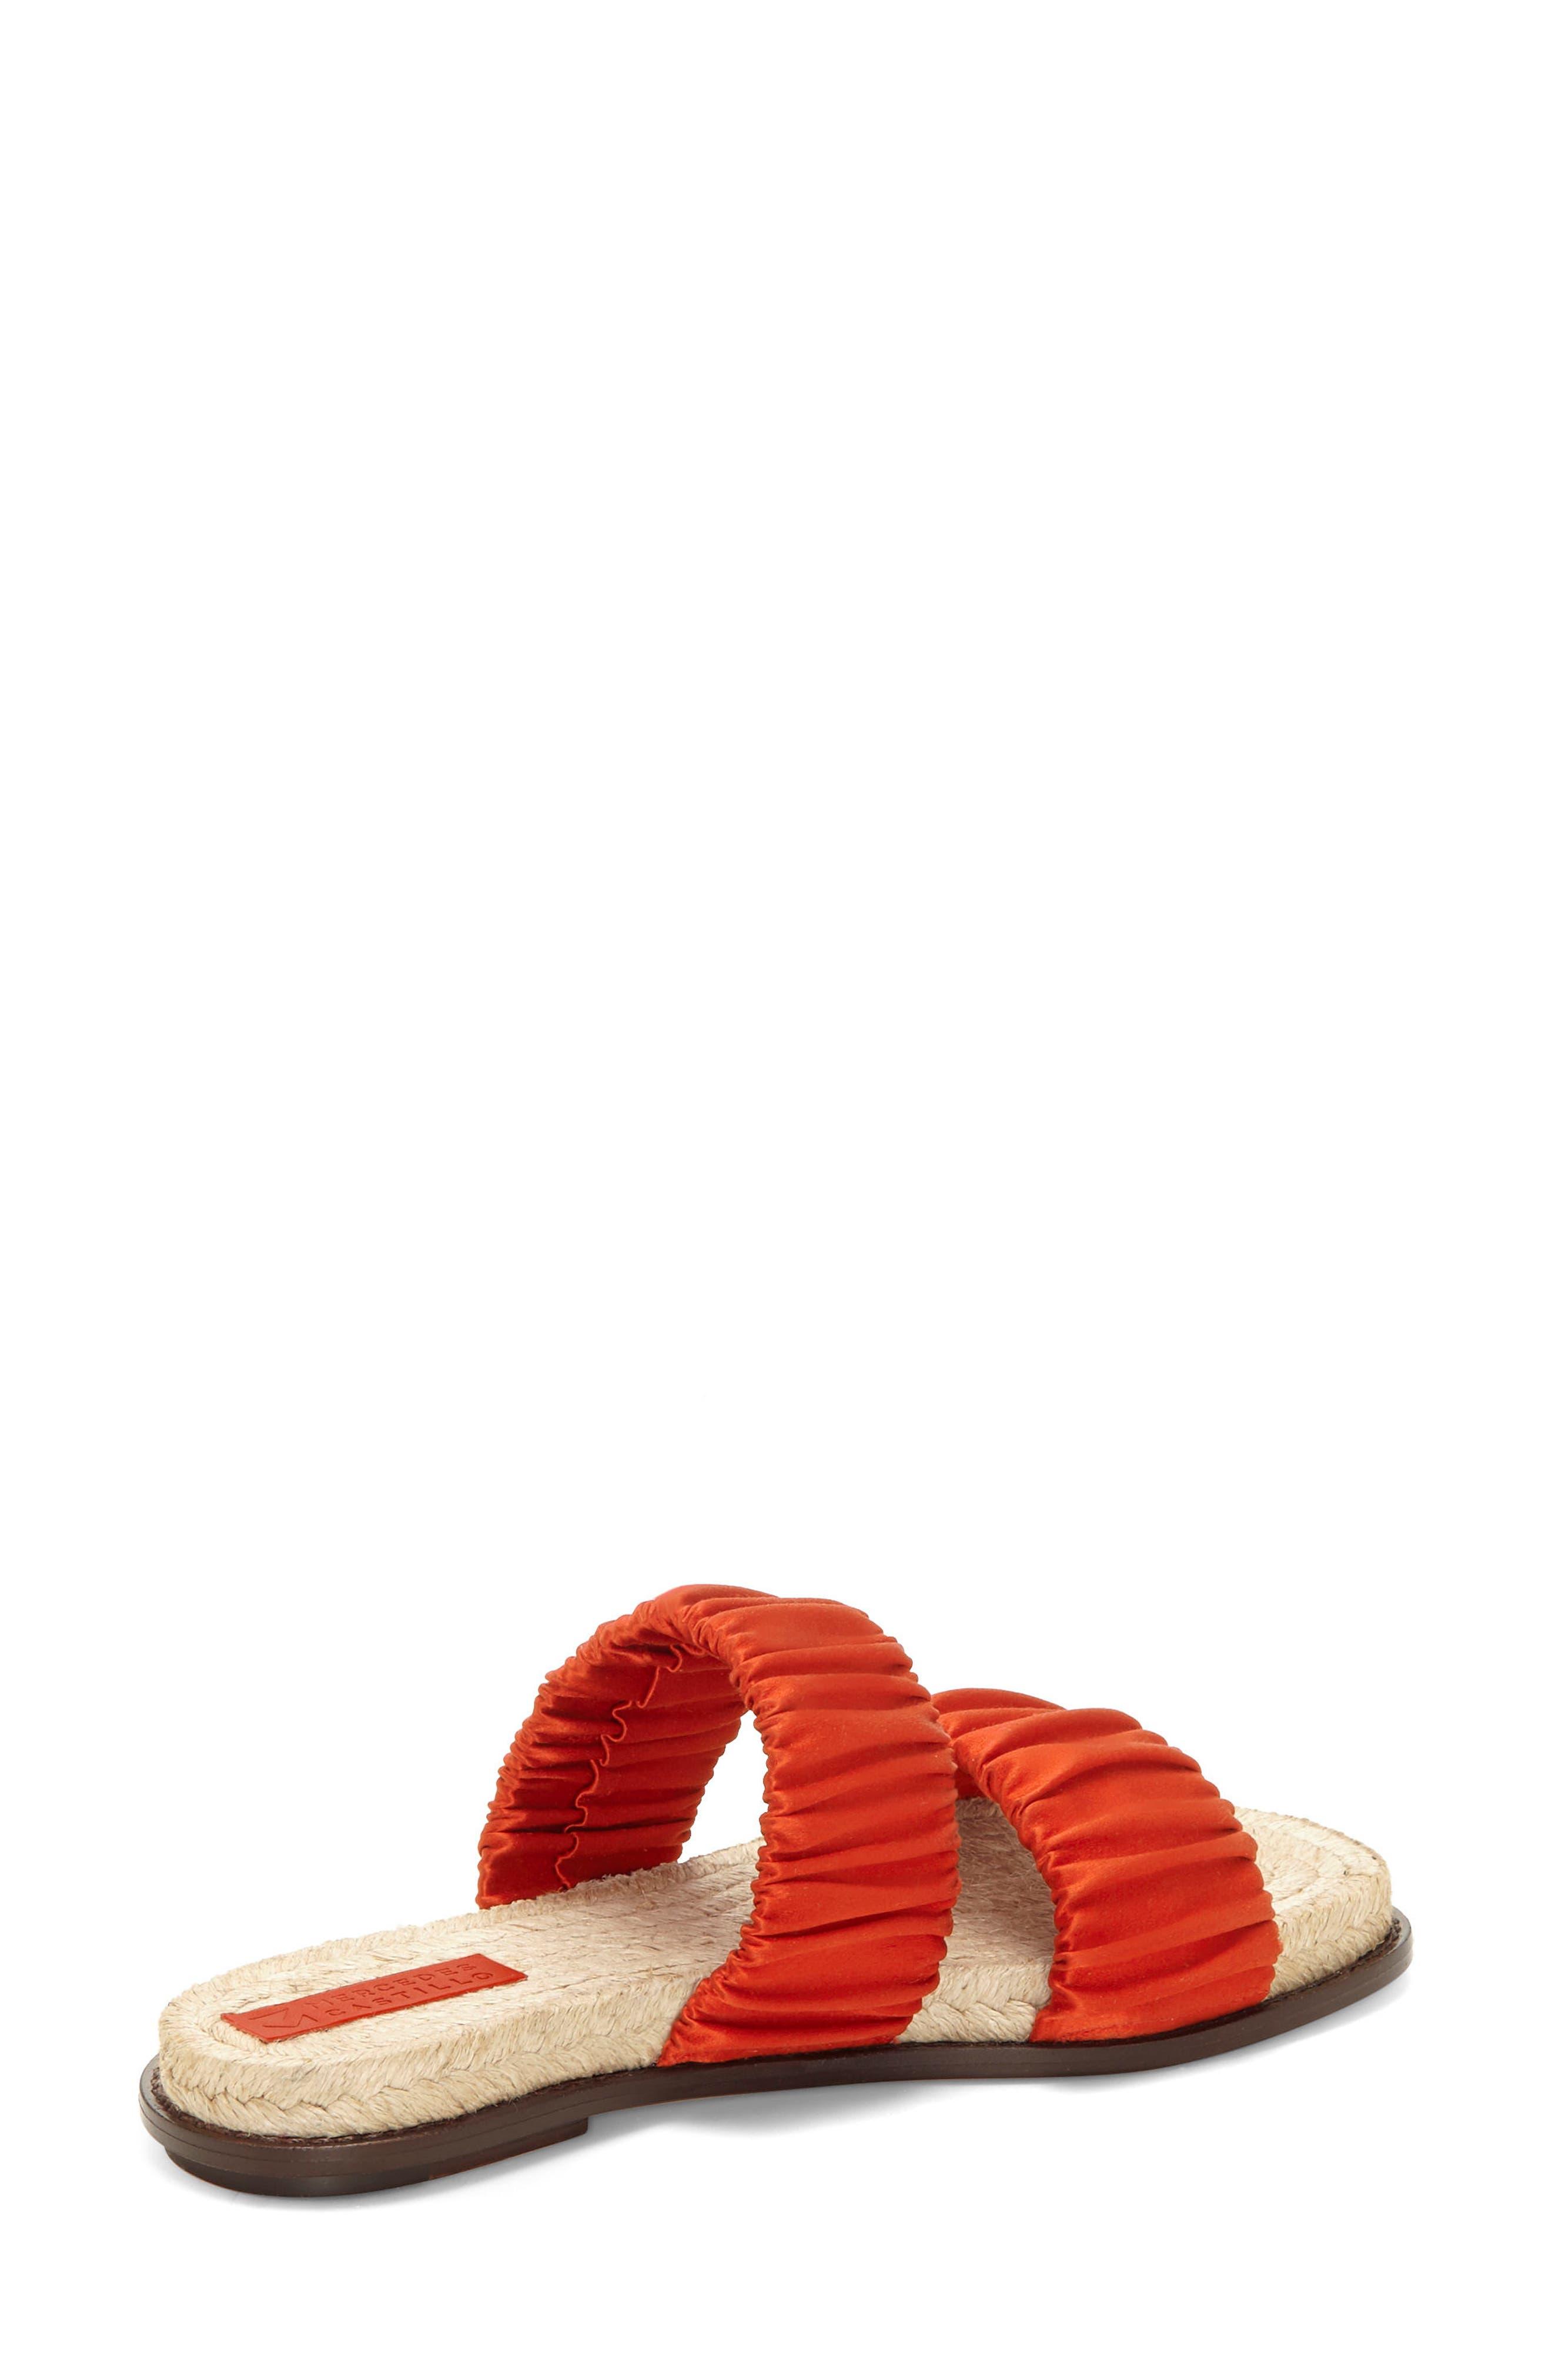 Espadrille Sandal,                             Alternate thumbnail 2, color,                             Red Tulip